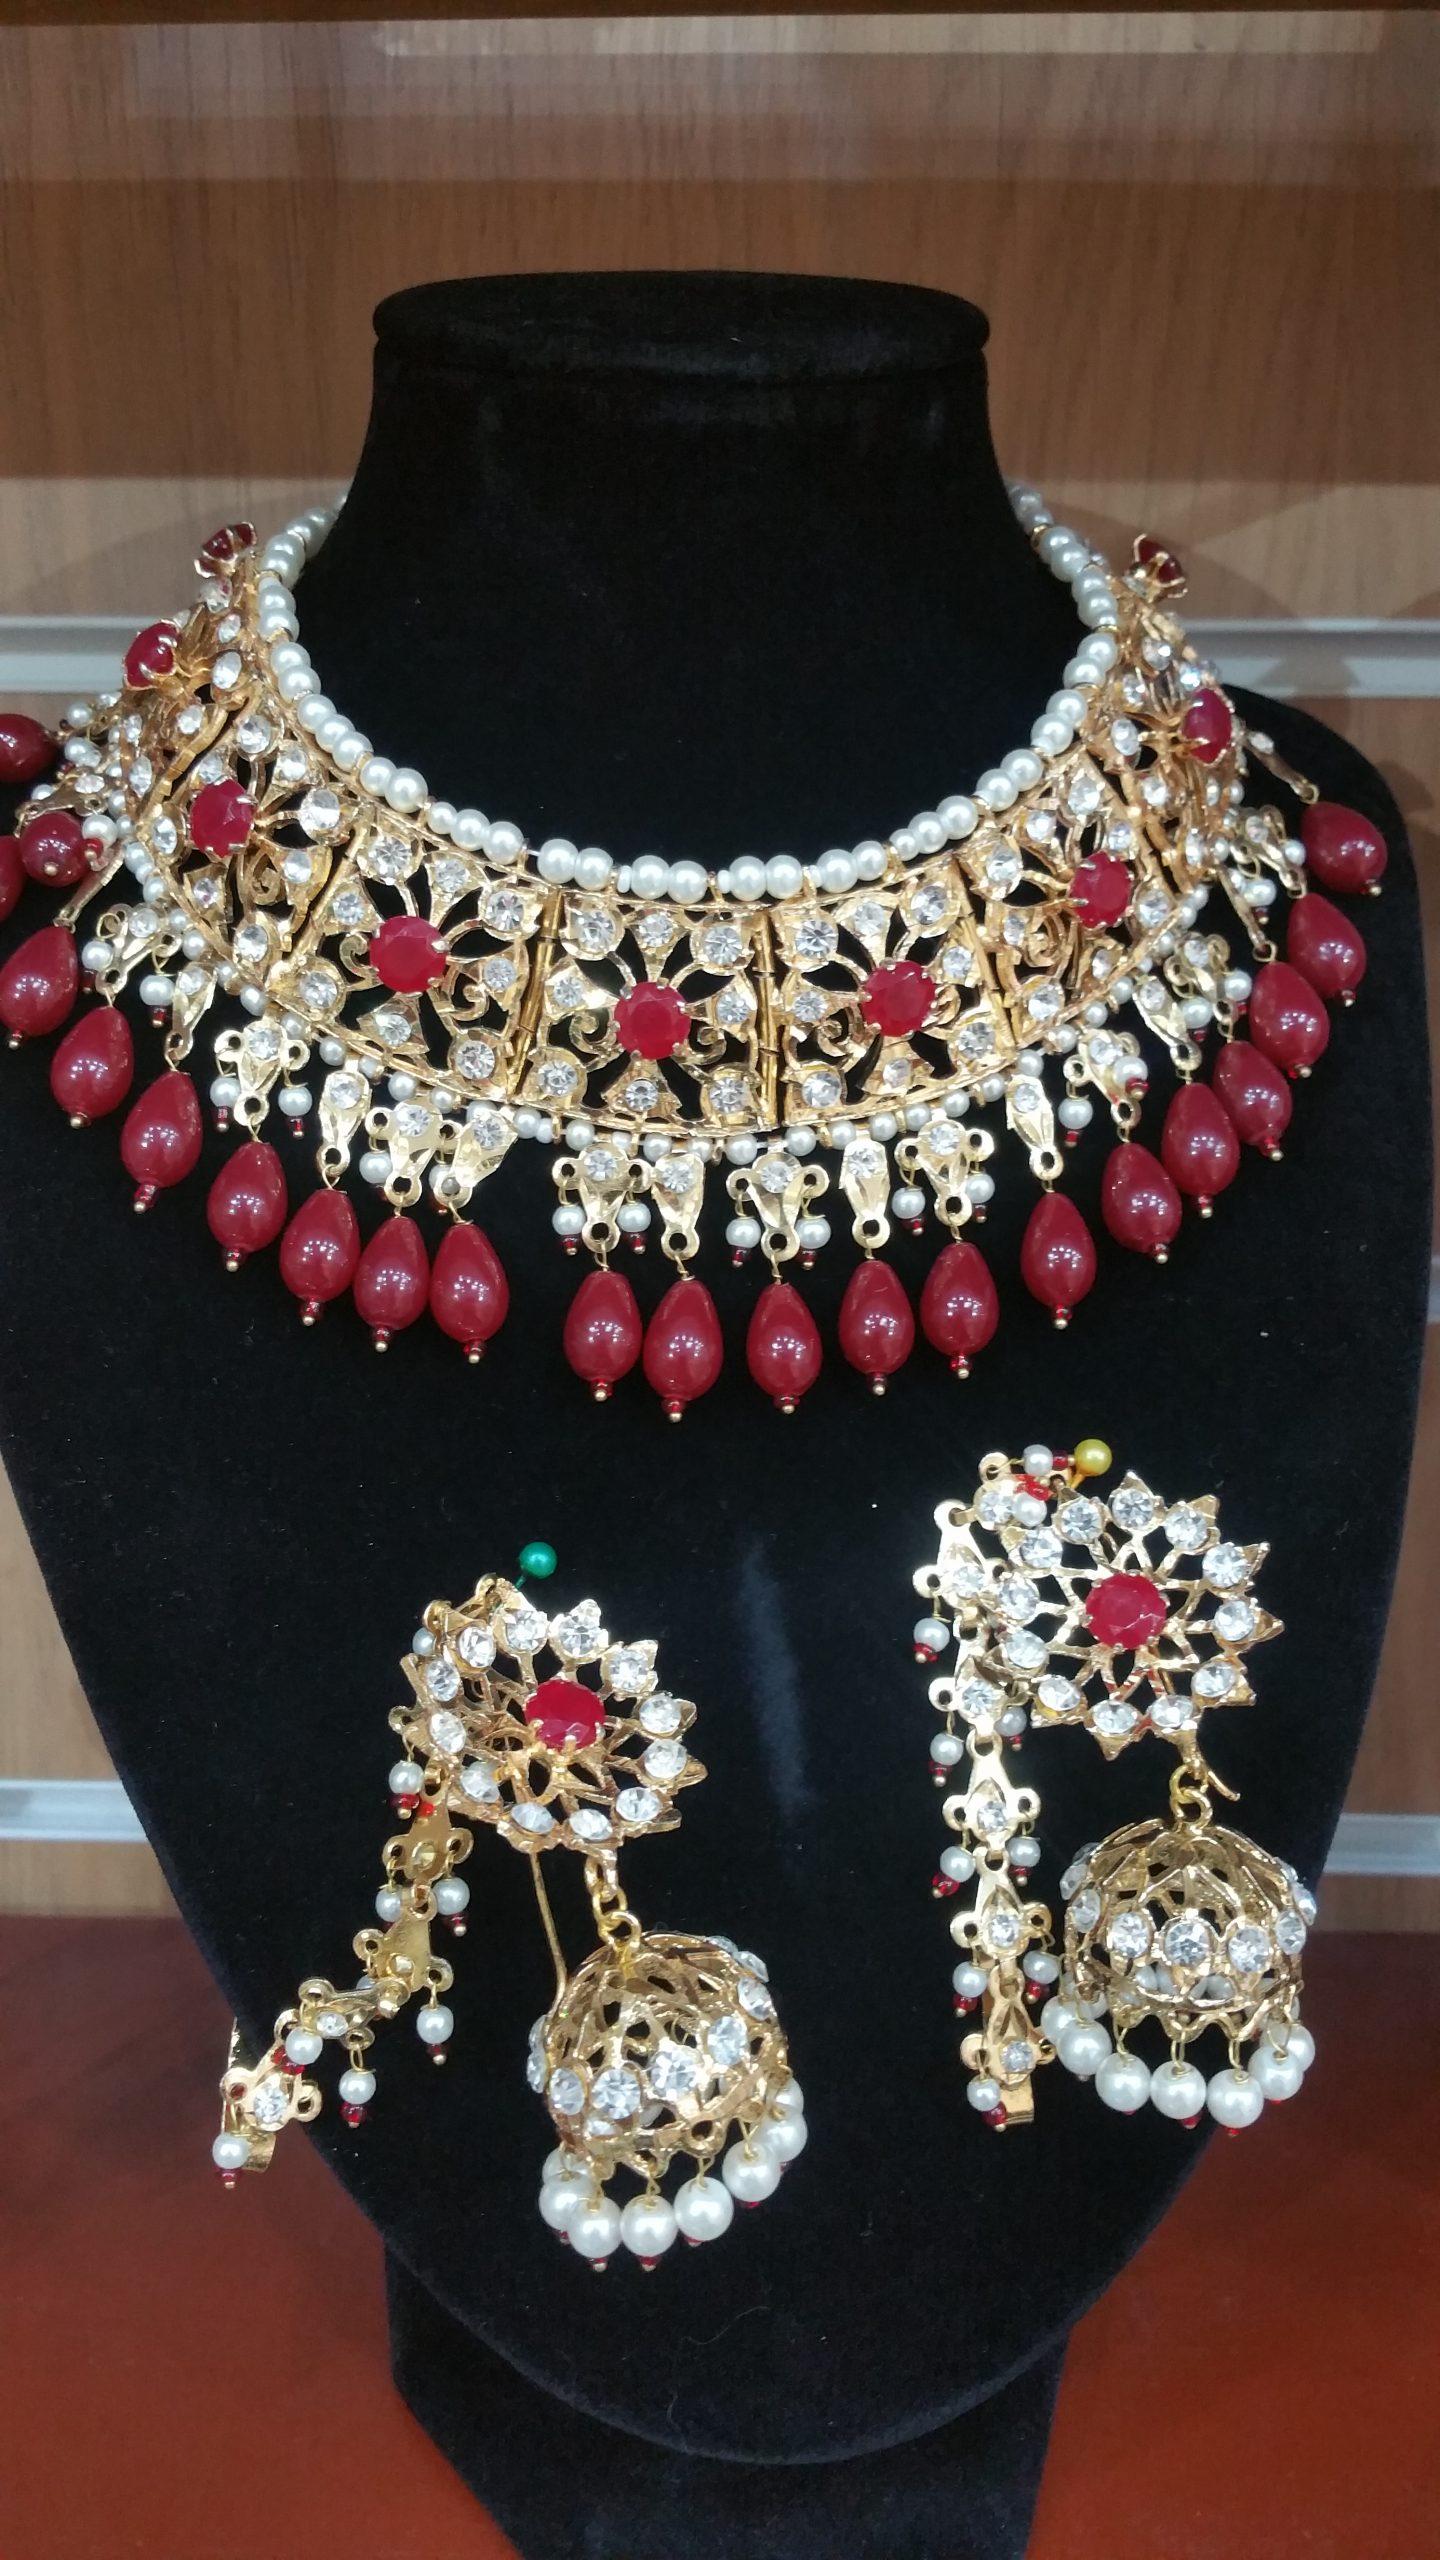 hydrabadi choker - maroon choker - wholesale Pakistani jewellery - bespoke Pakistani jewellery